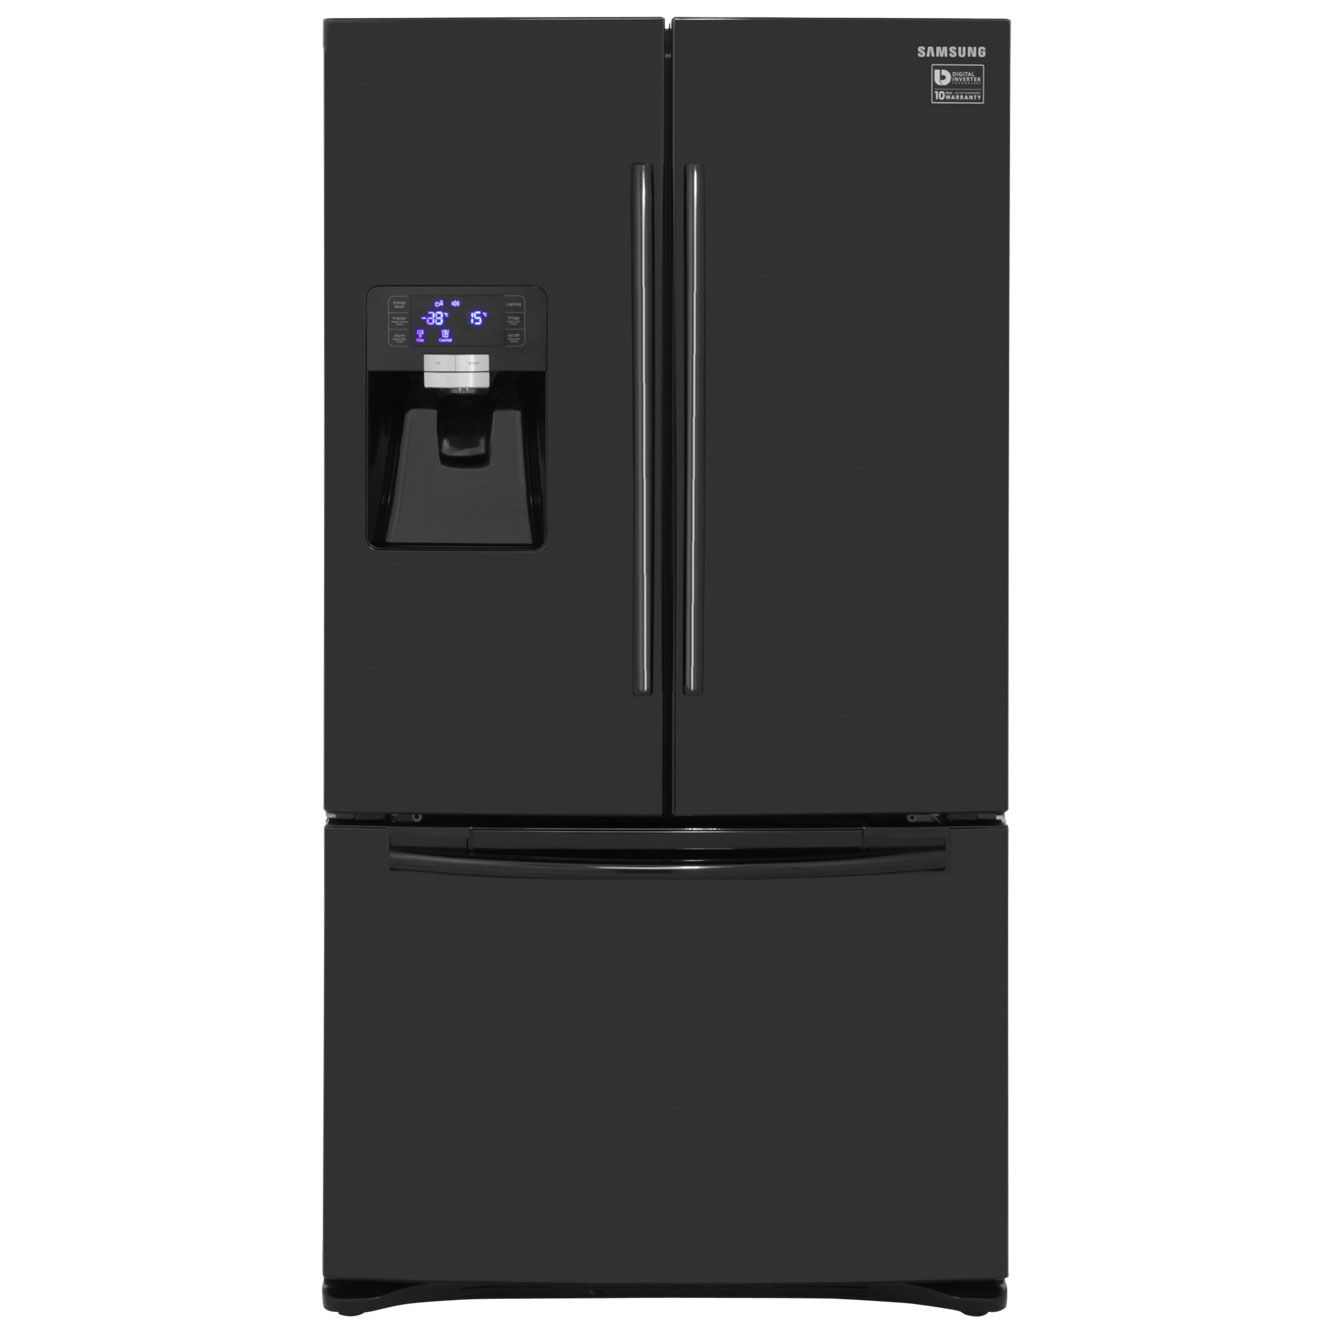 Samsung G Series Rfg23uebp American Fridge Freezer Black A